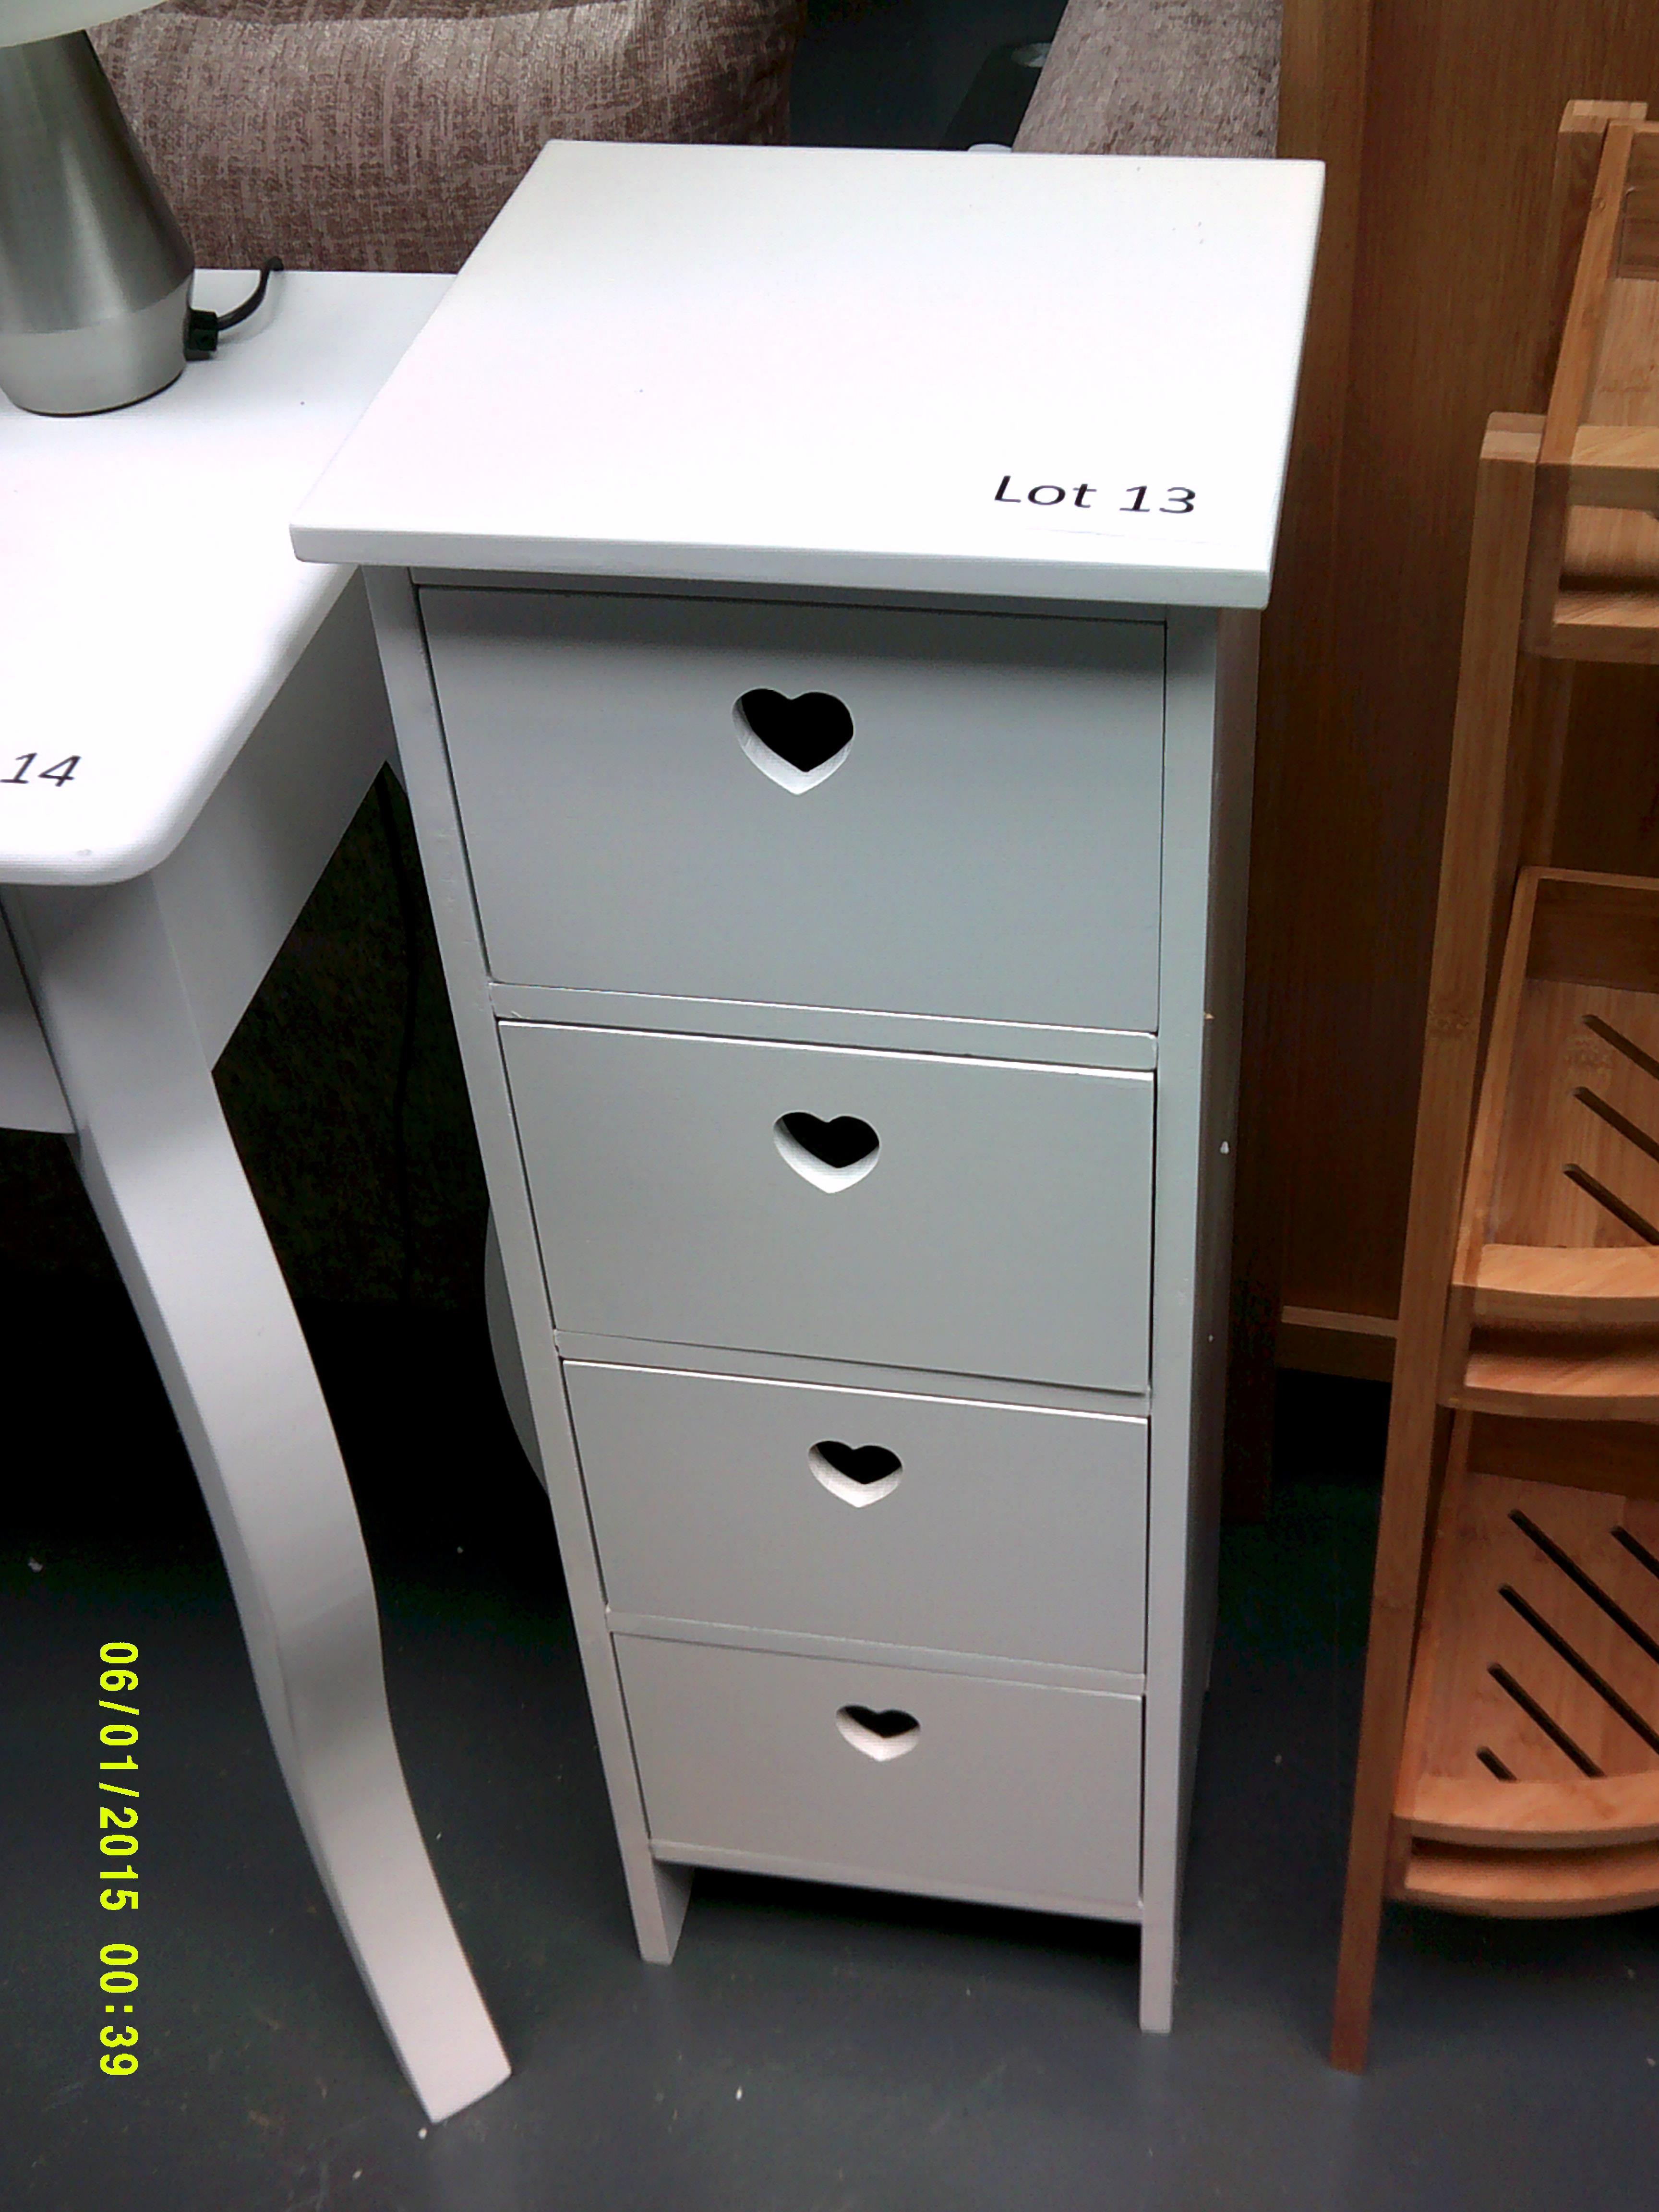 Lot 13 - White 4 Drawer Unit with Heart Detail Customer Returns